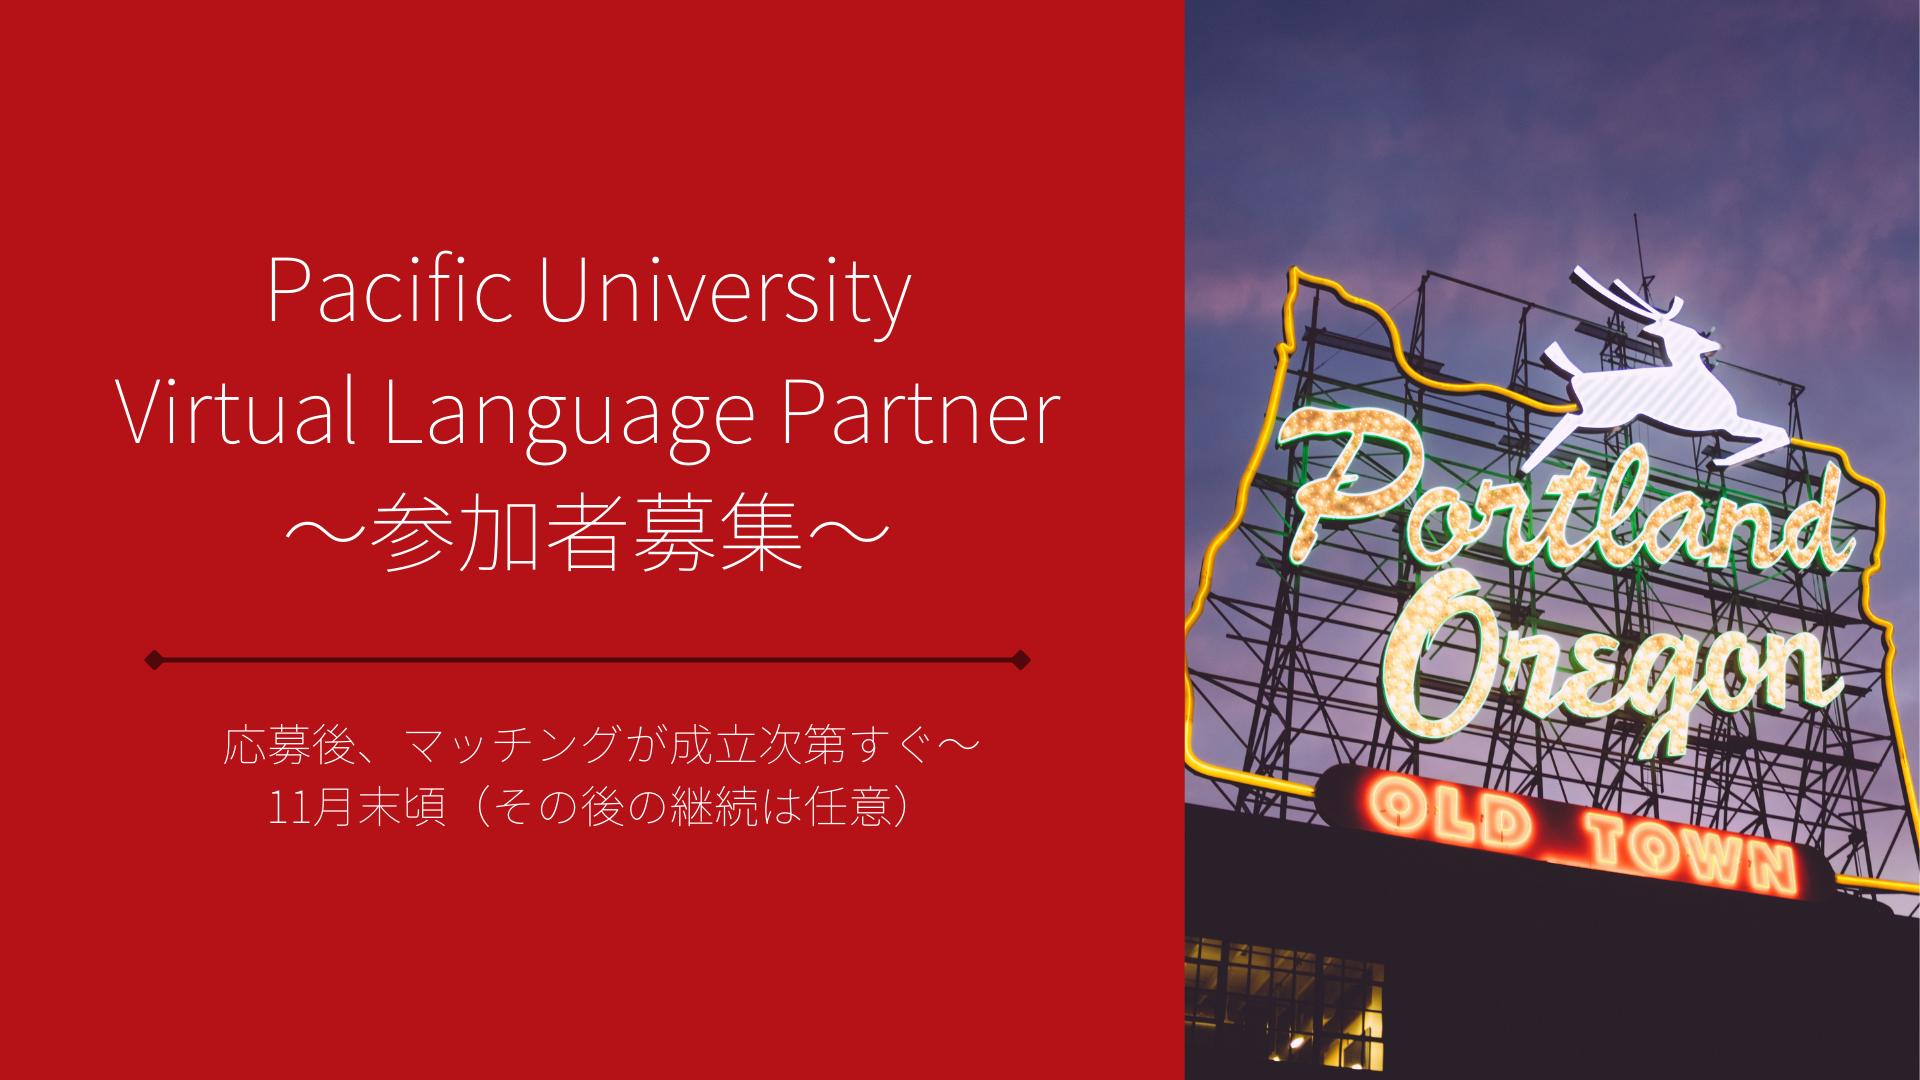 【参加者募集】Pacific University Virtual Language Partner